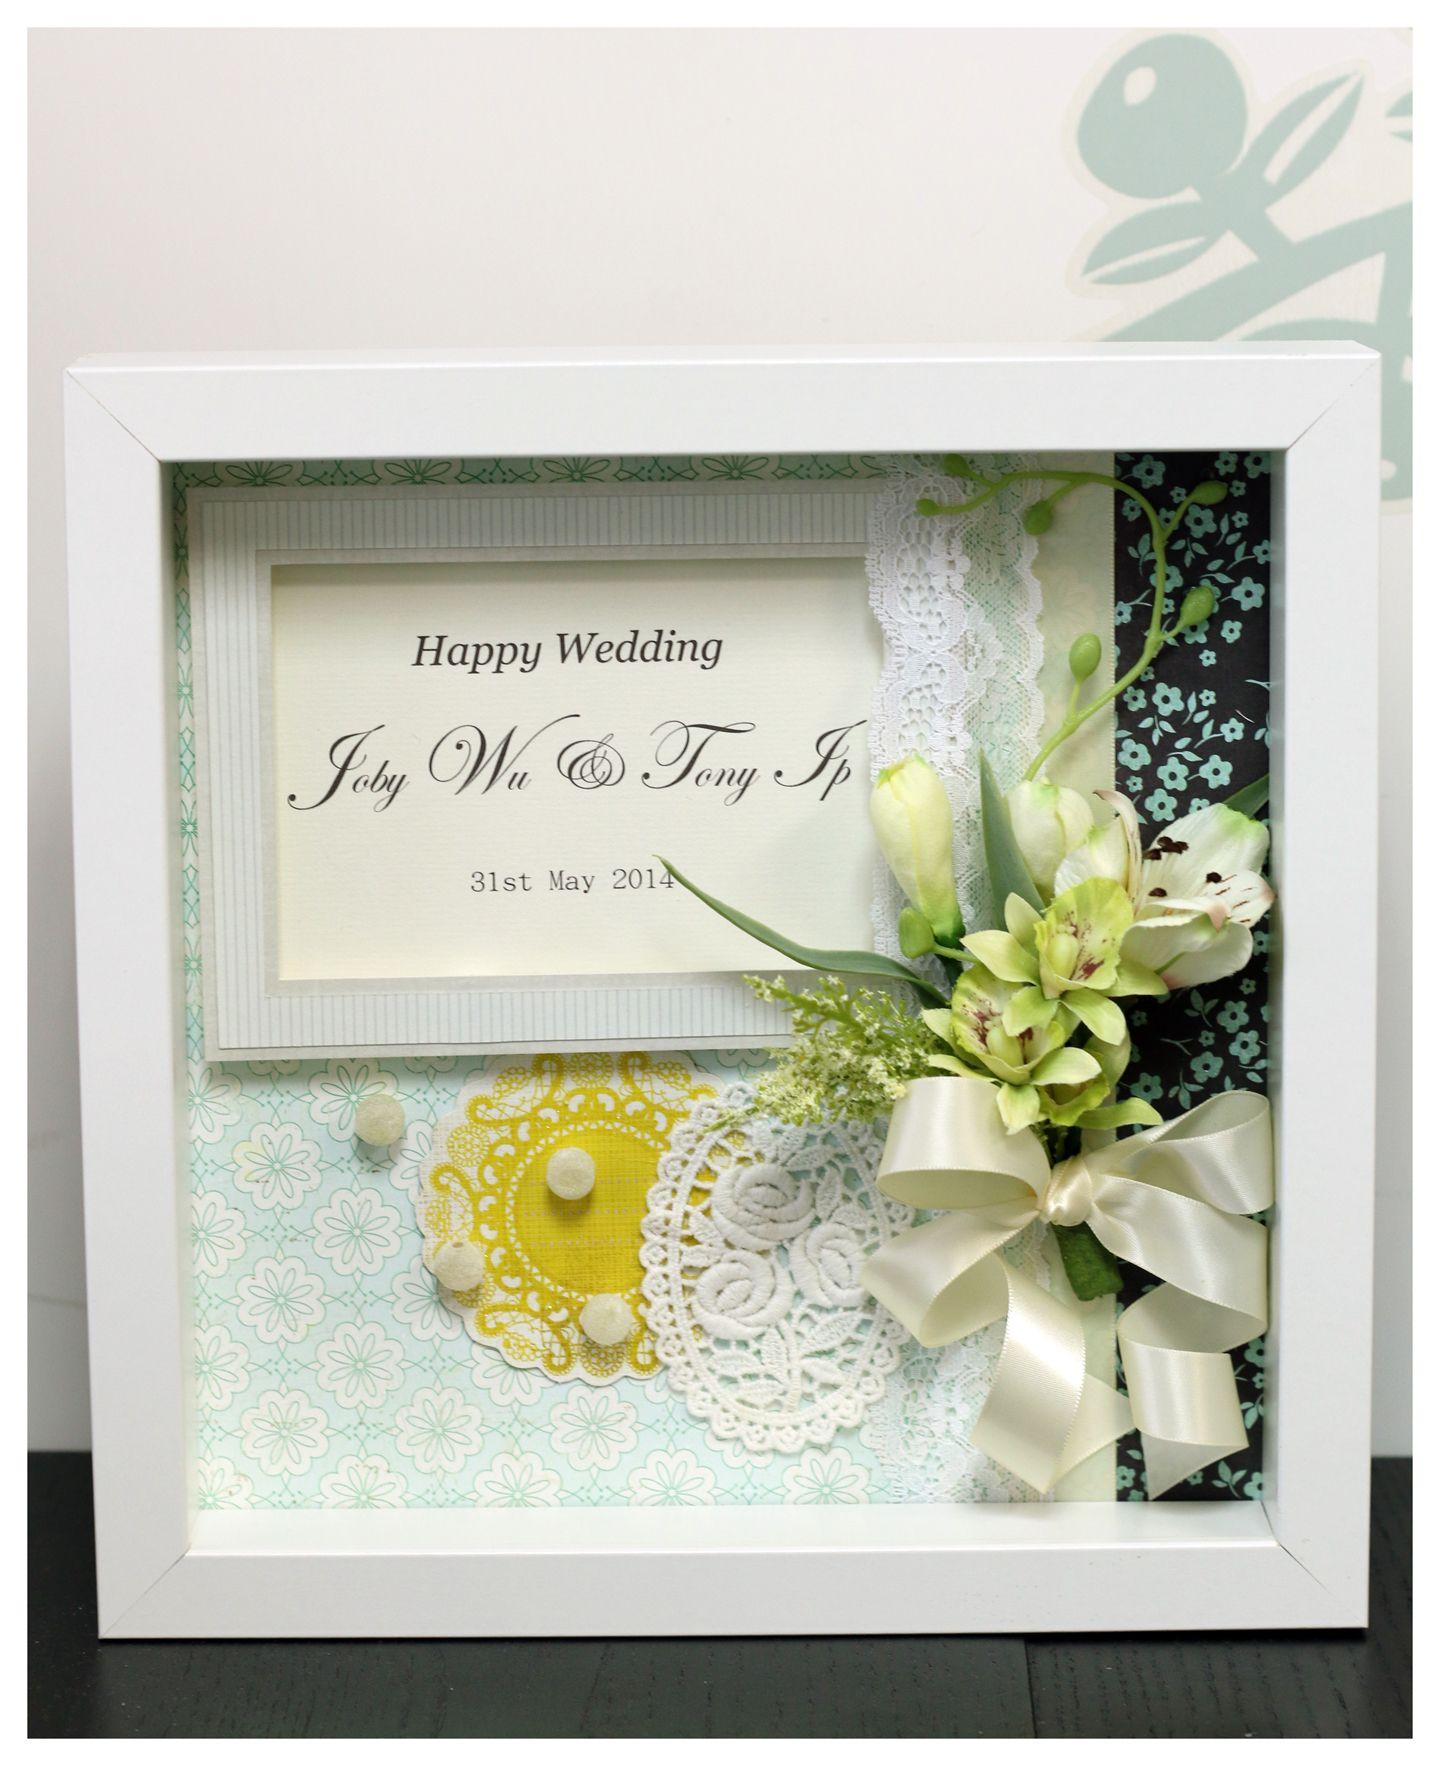 Pegeo Wedding Reception Boxed Frame | Pegeo Wedding | Pinterest ...